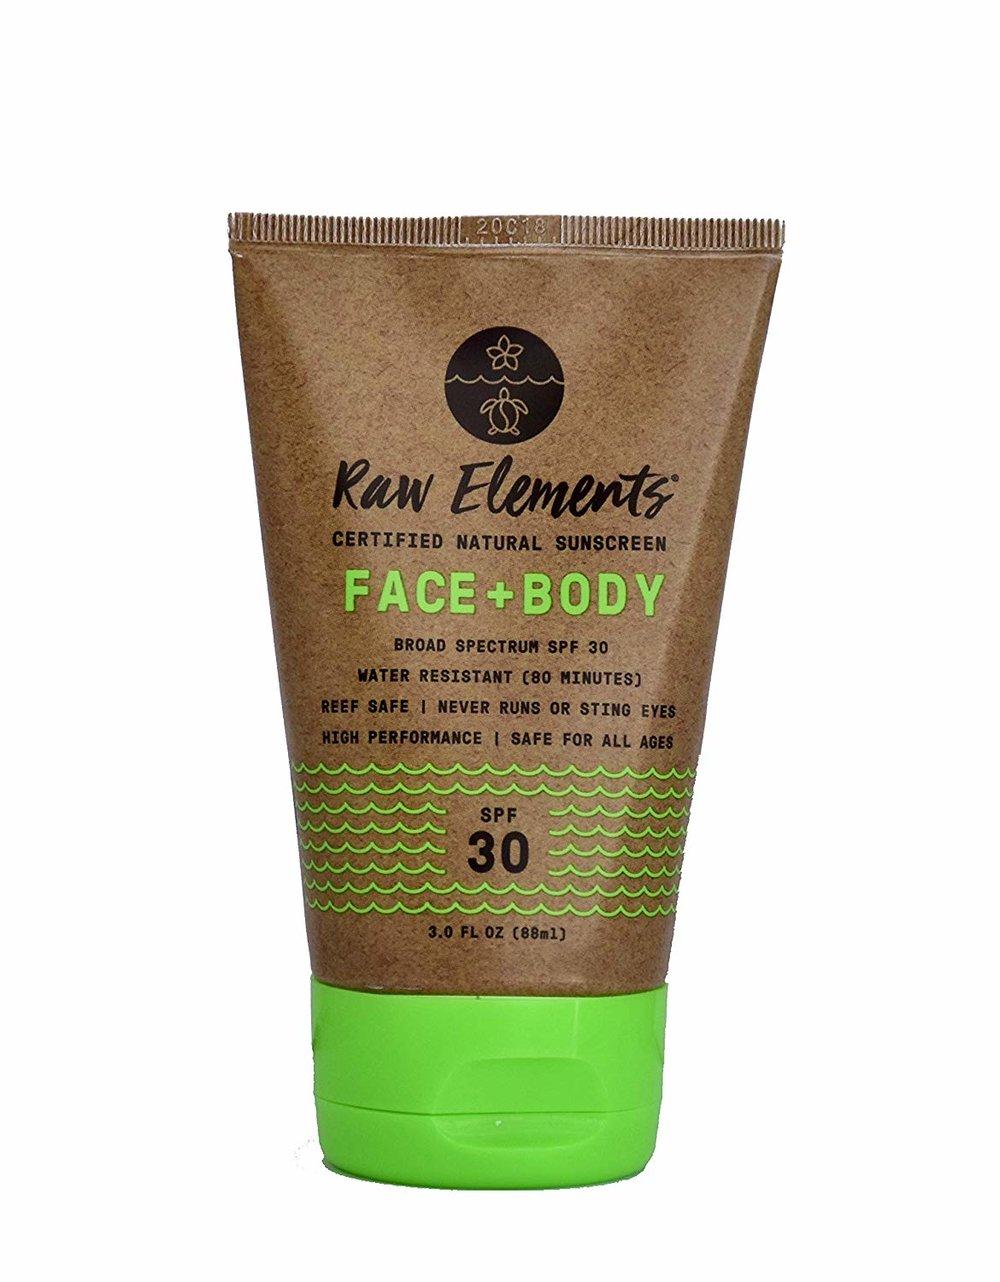 Organic Natural Sunscreen Face & Body SPF 30